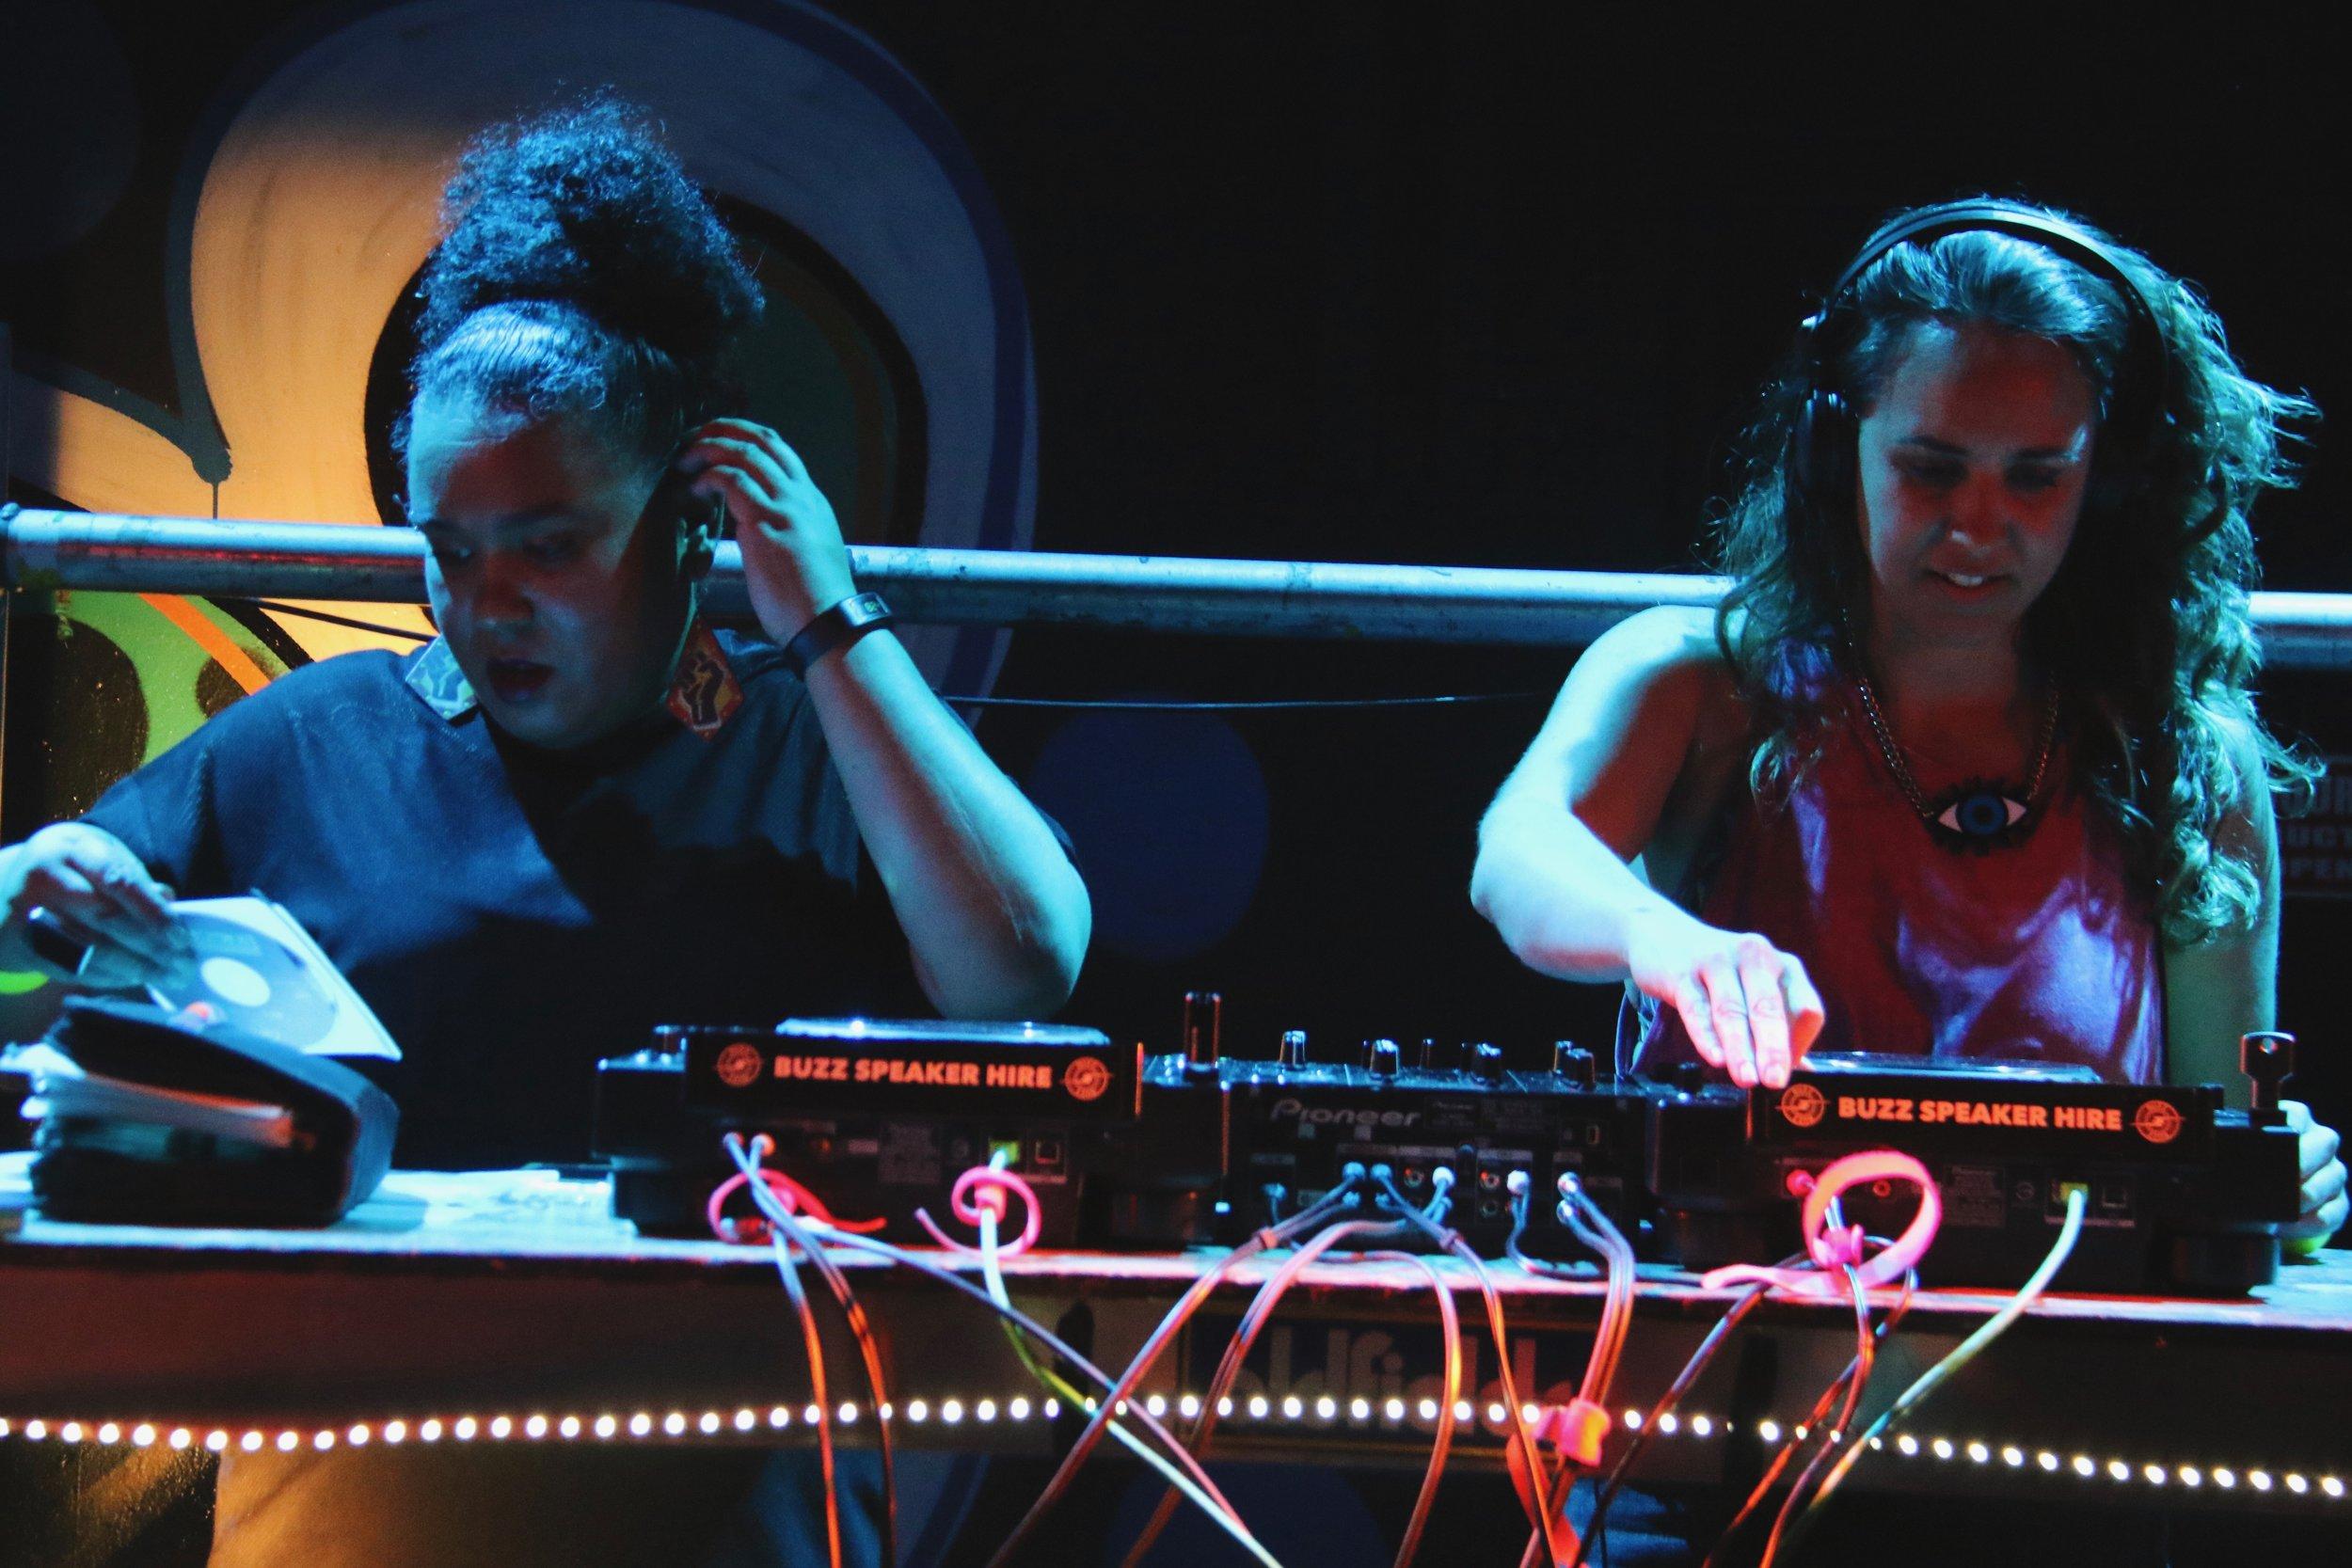 DJ Emily Nicol and DJ Renee Williamson performing at PACT Salon: BAD. Photo by Carla Zimbler